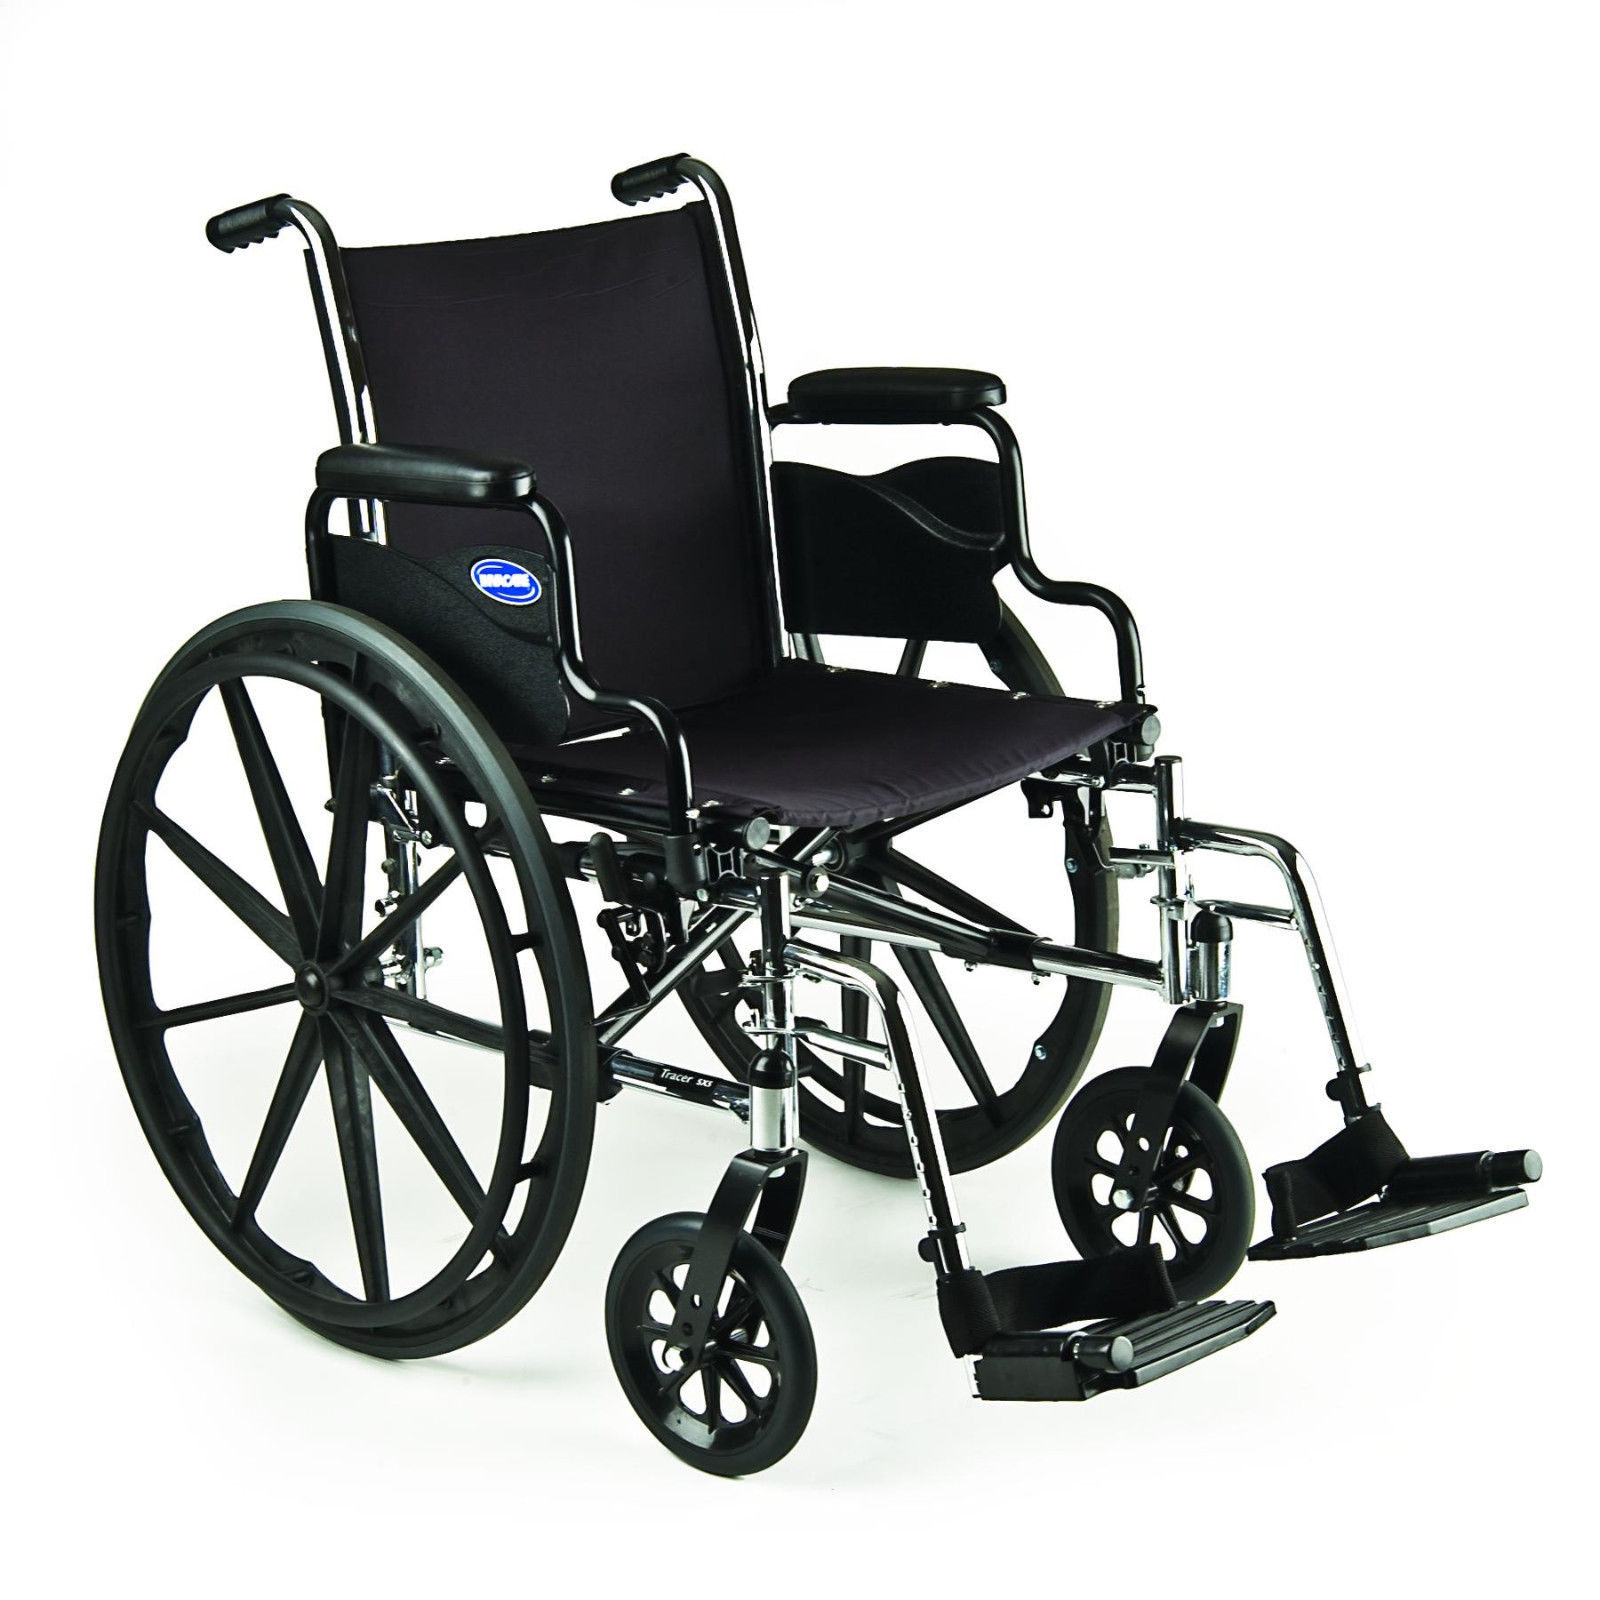 Invacare Tracer SX5 18x16 Lightweight Wheelchair Flip Back Desk Length Arms w/Footrest